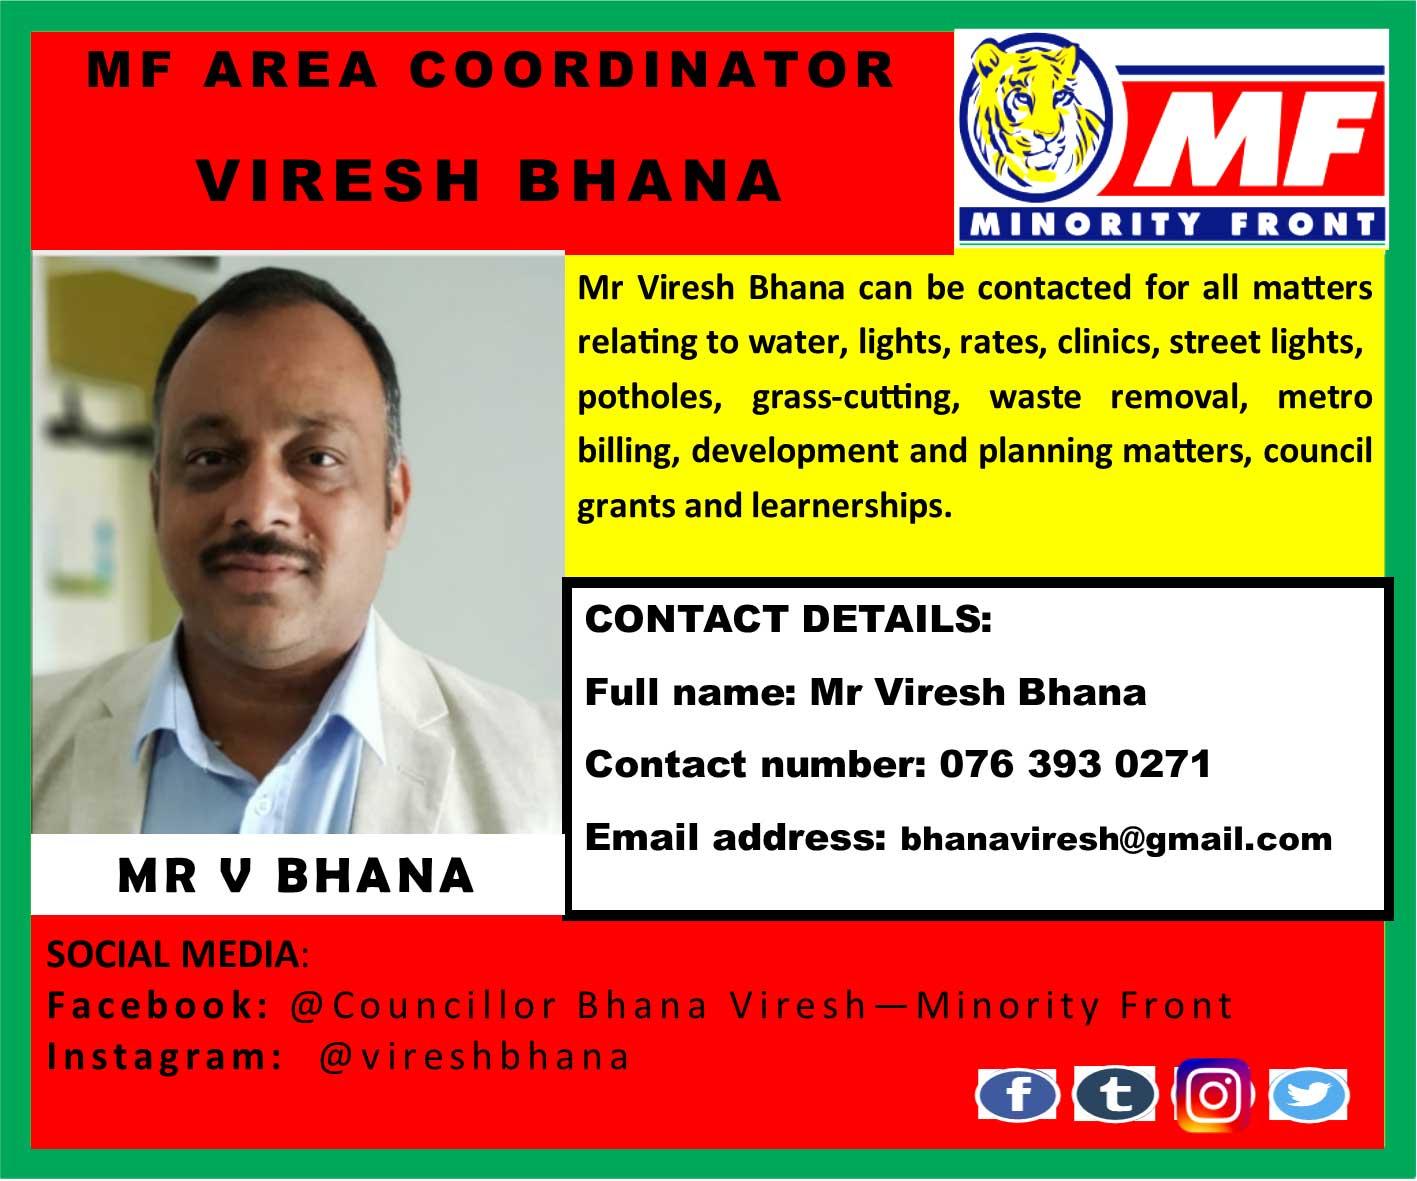 MF Area Coordinator Viresh Bhana